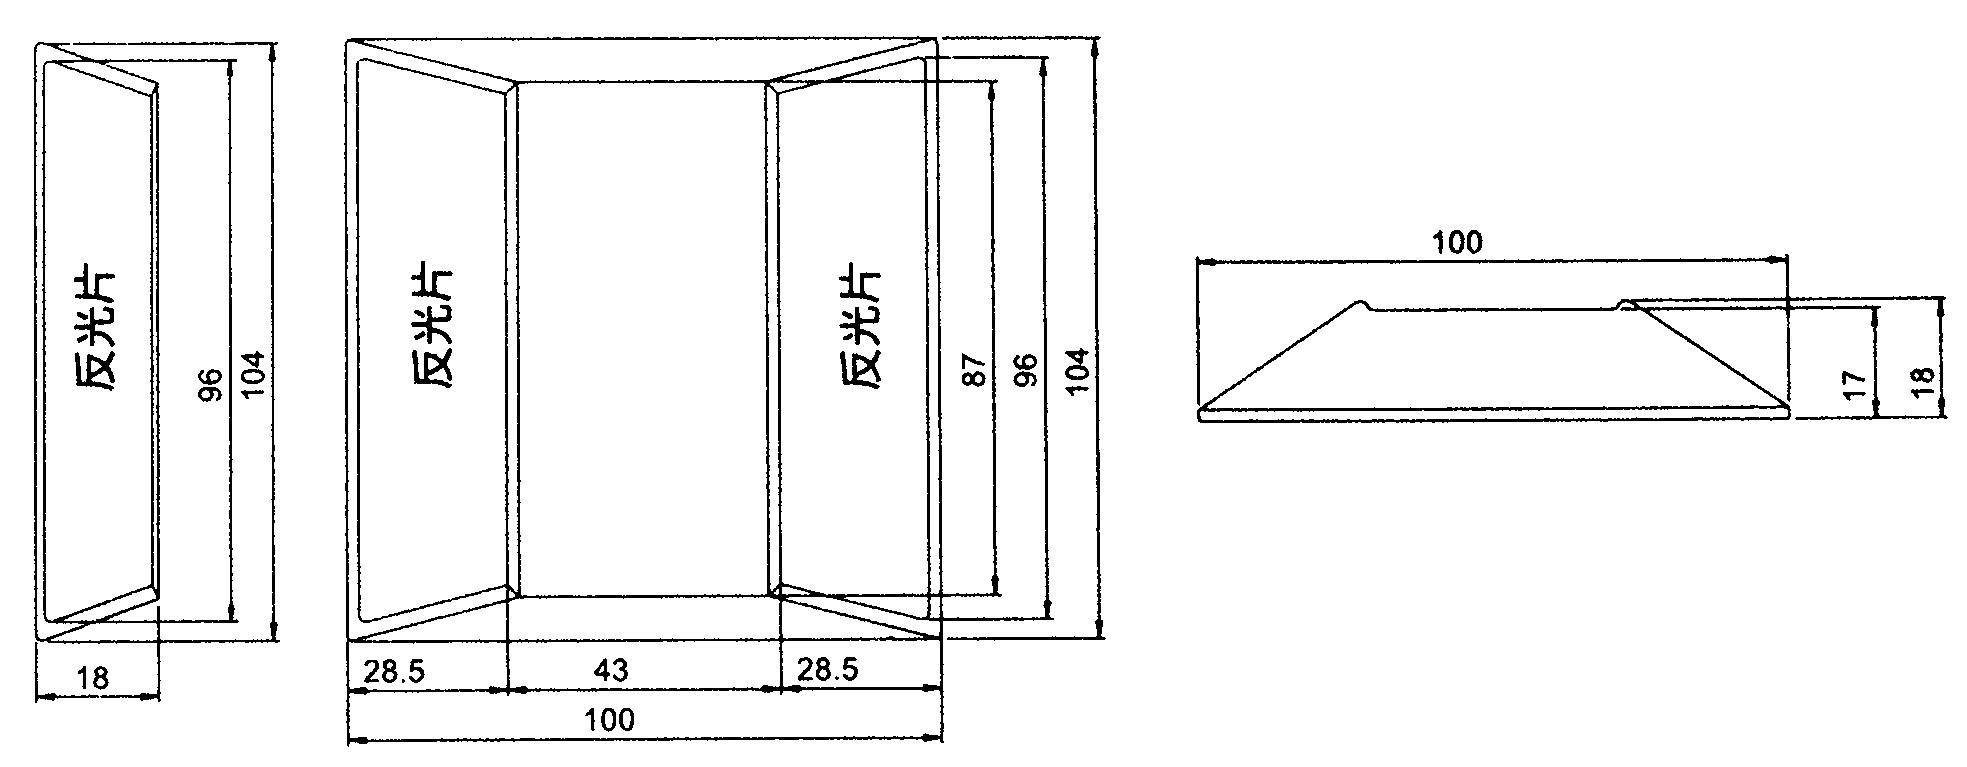 550 Flat-Bottom Double-Reflective Marker